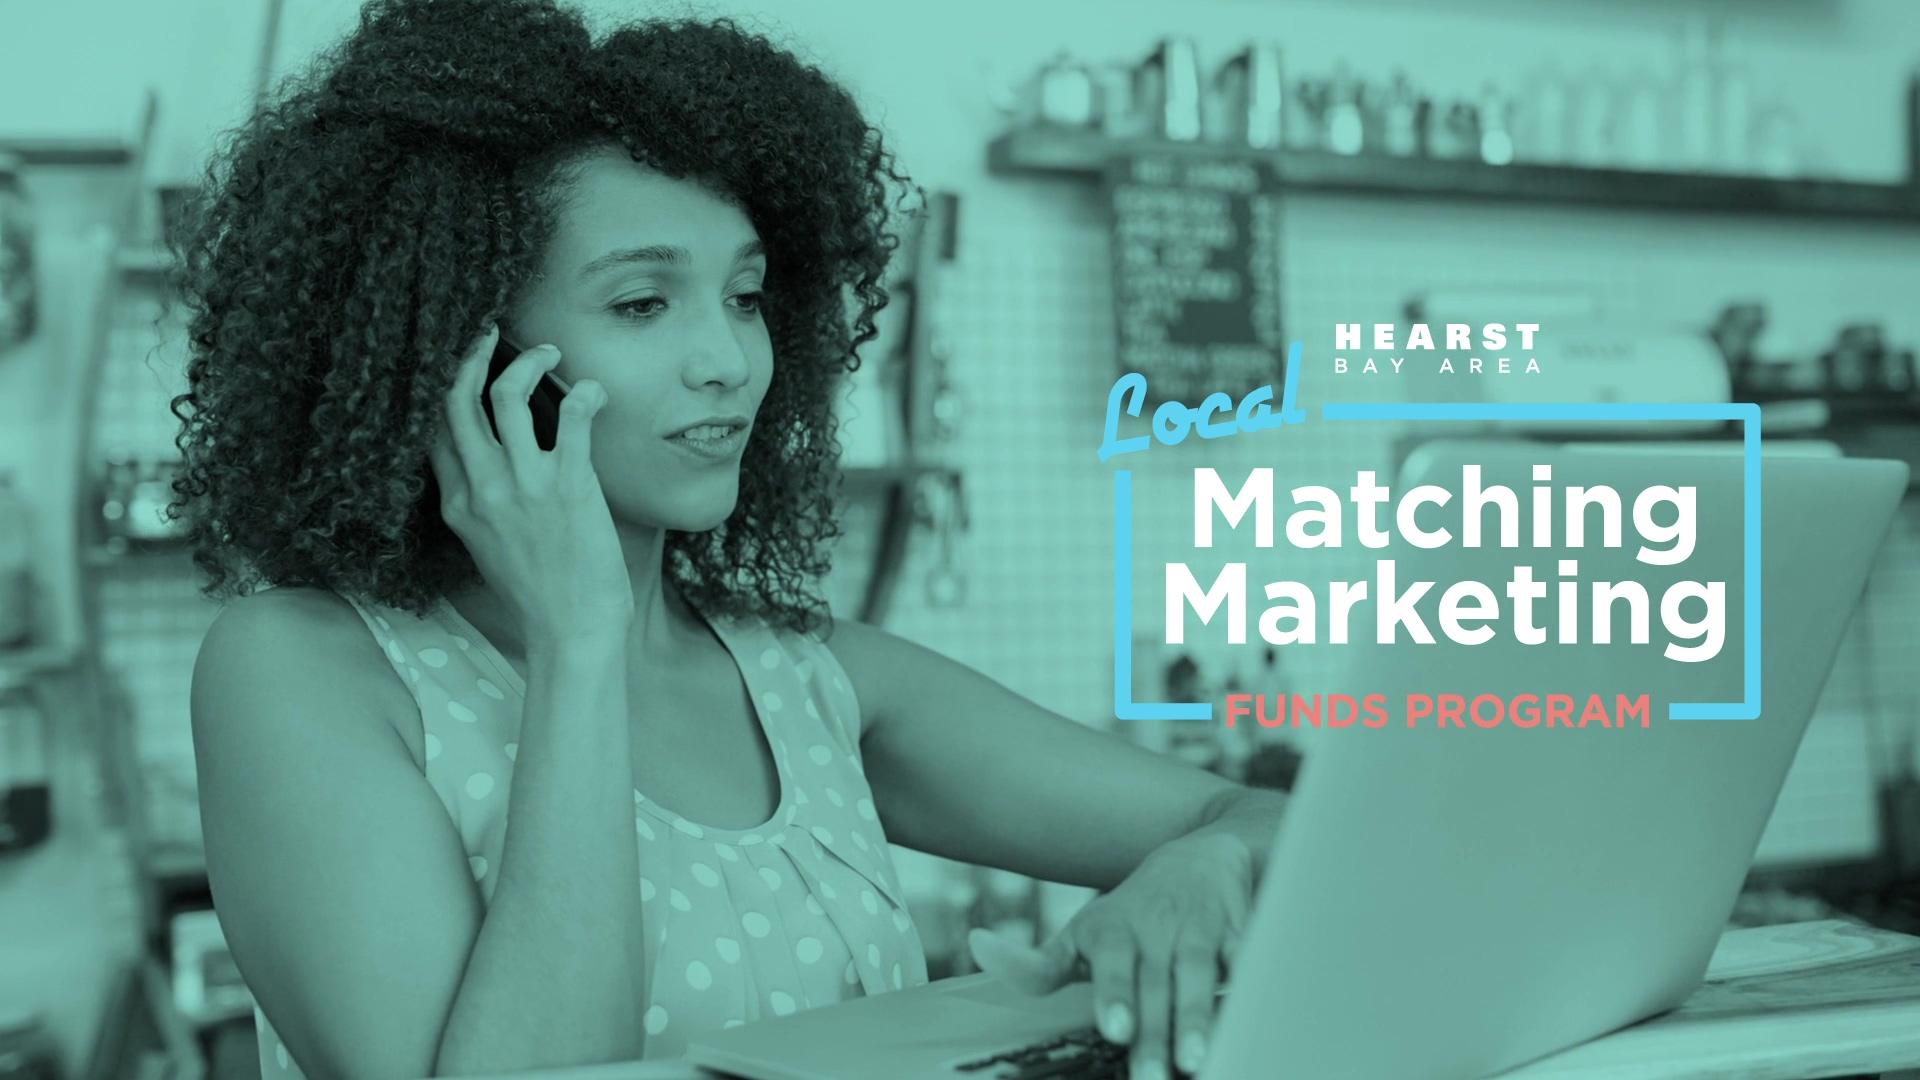 Matching Marketing Fund Video